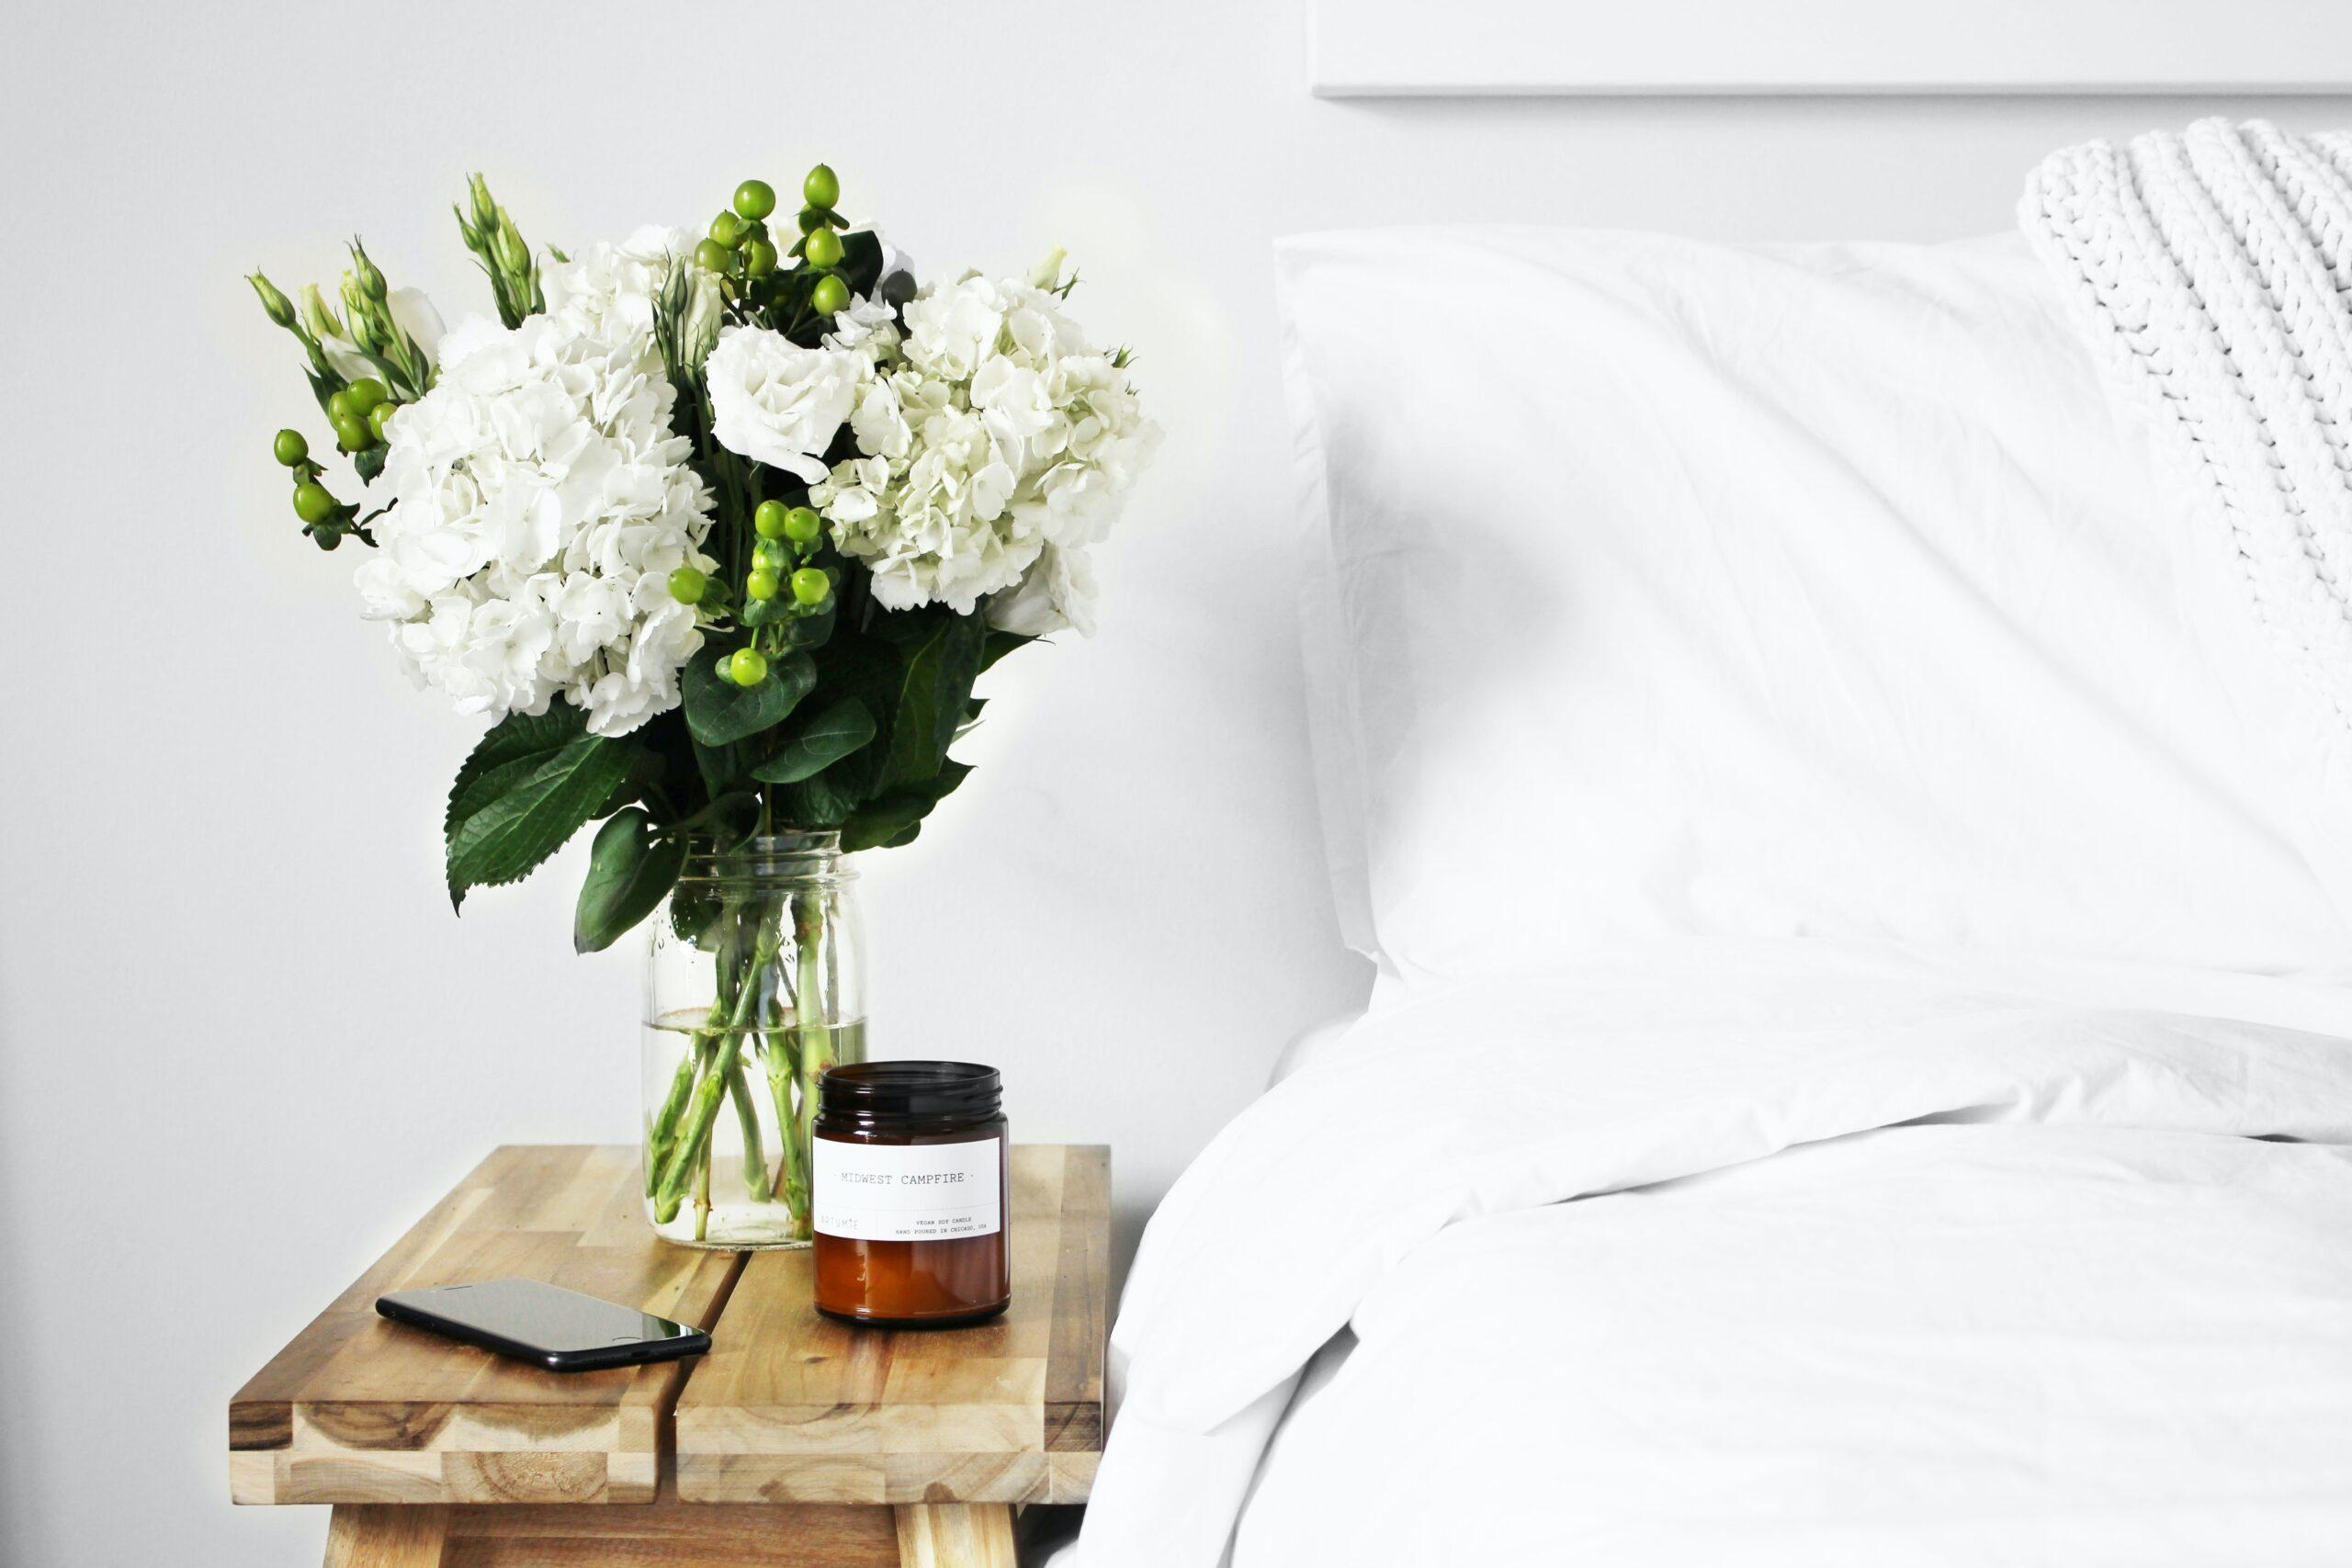 Franky's 5x best sleeping tips during quarantine